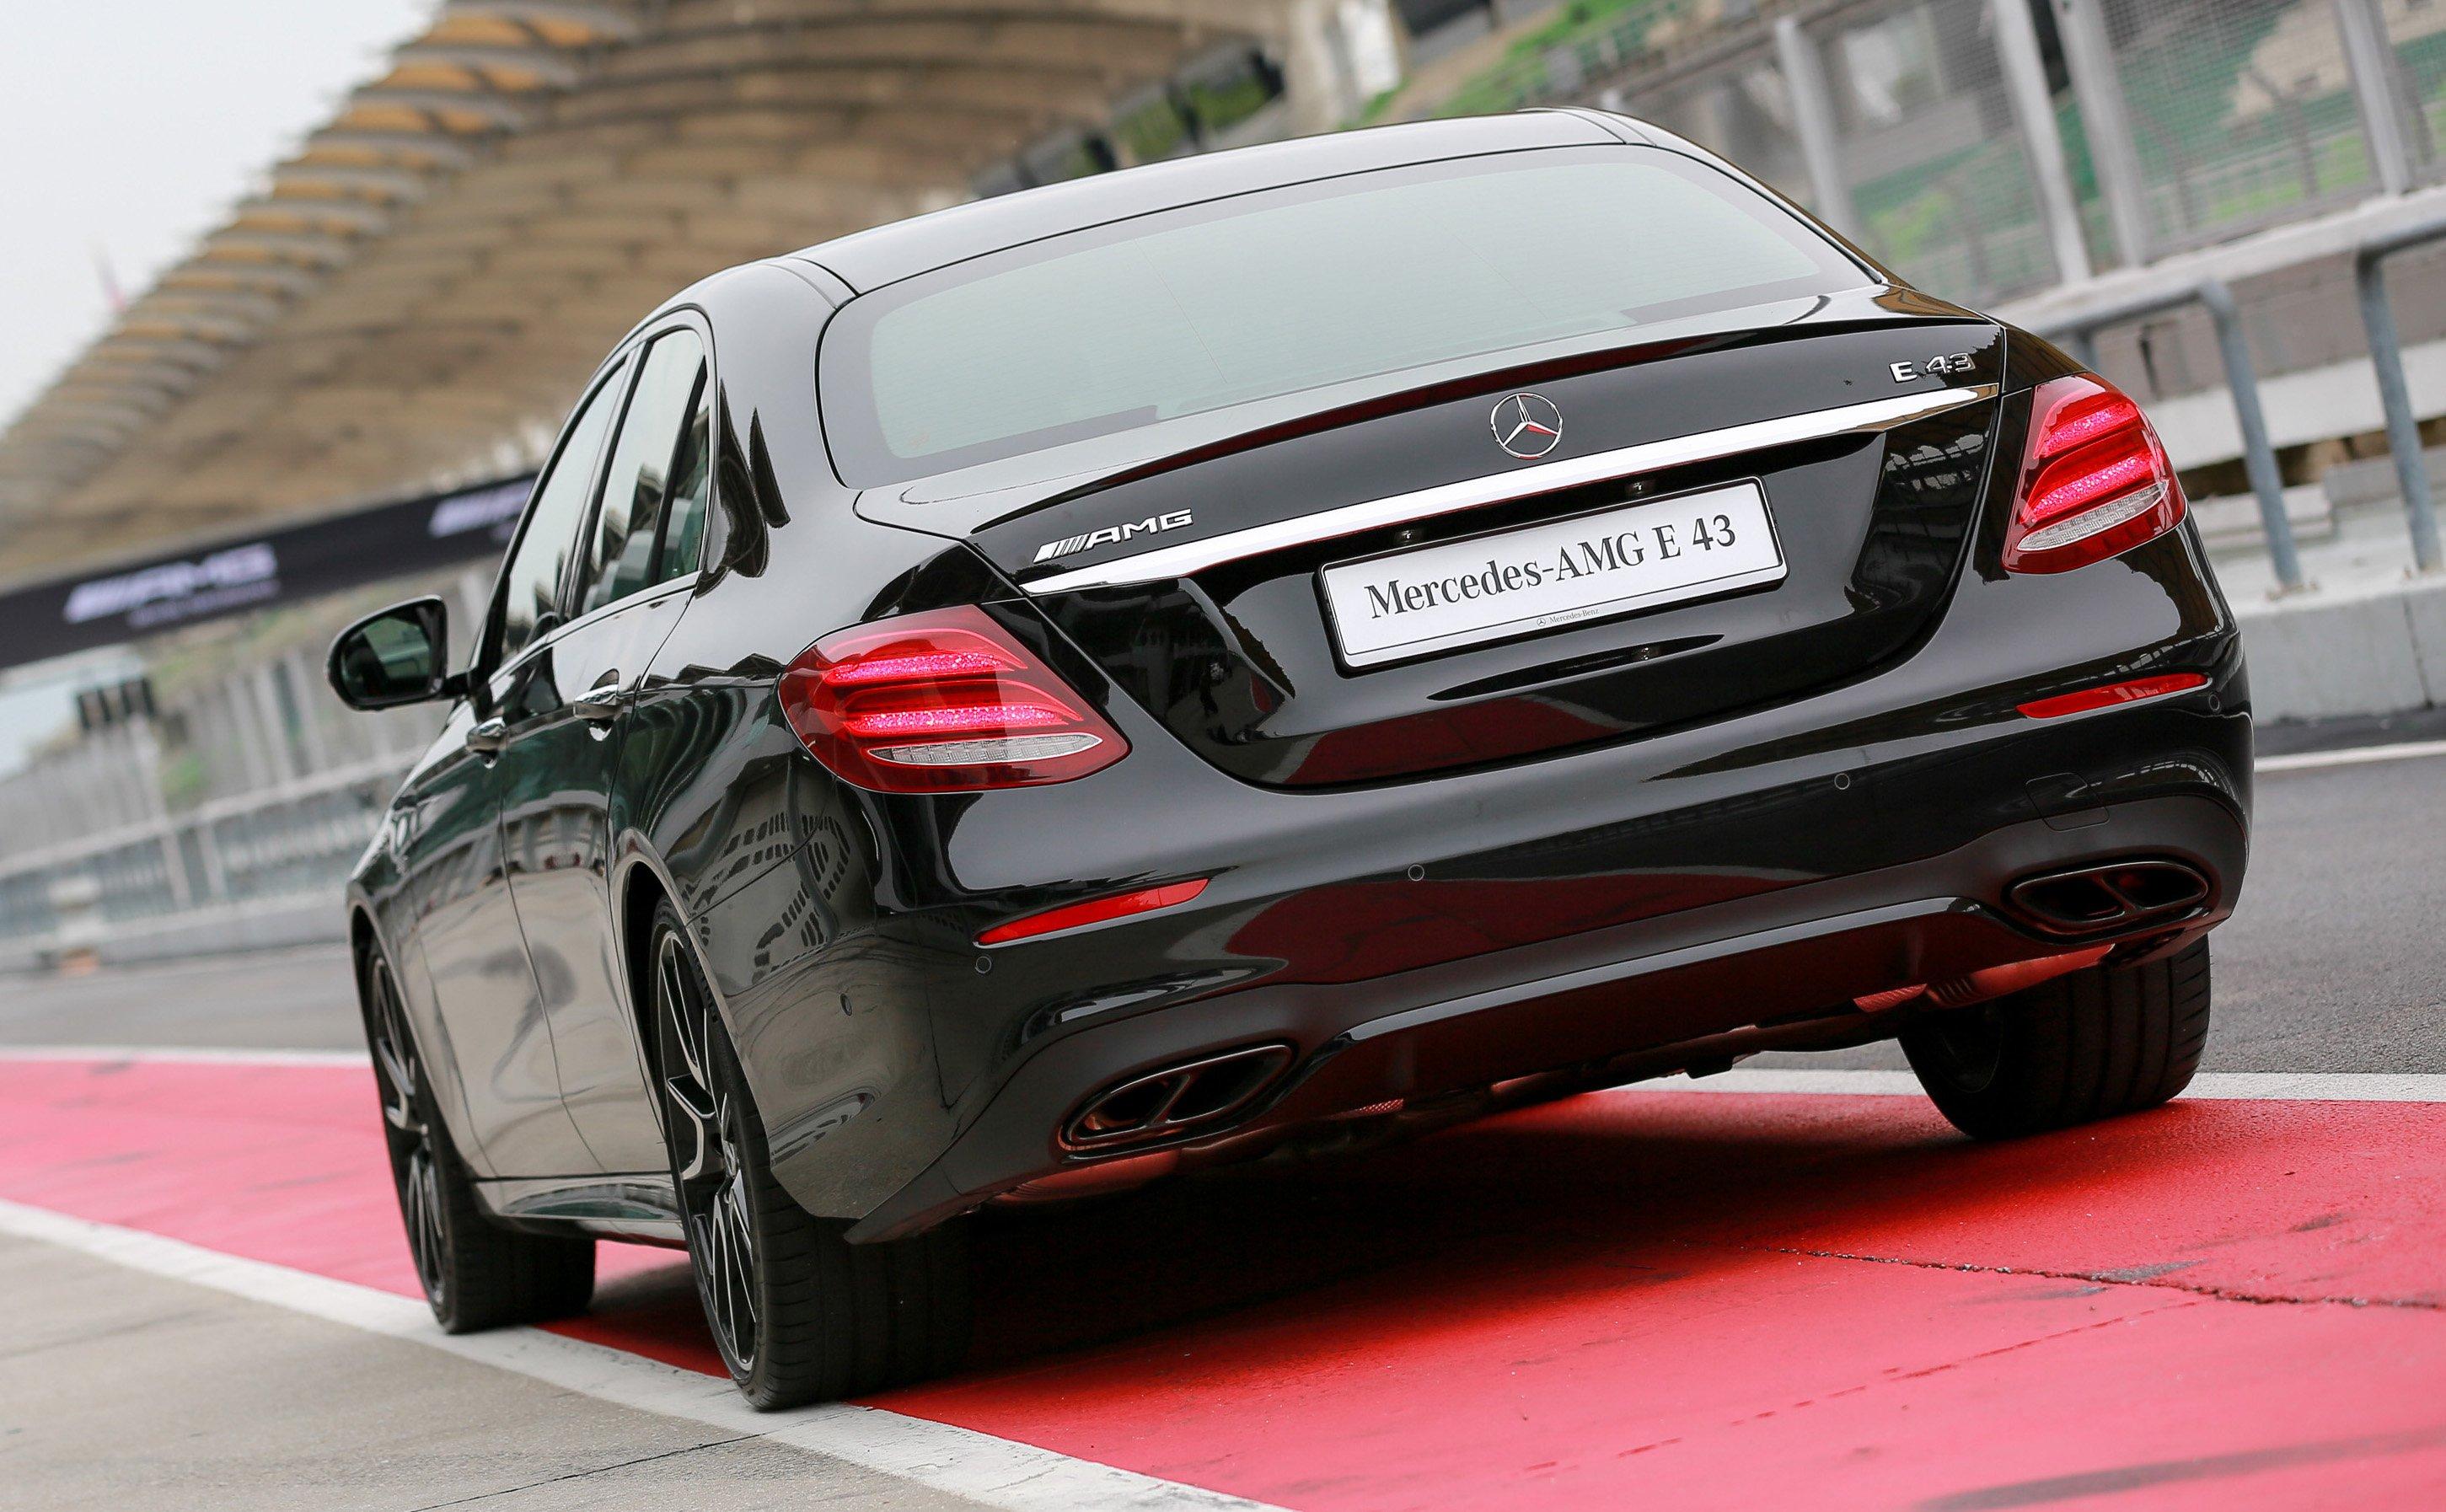 https://s1.paultan.org/image/2017/05/Mercedes-AMG-E-43-4Matic-official-5.jpg